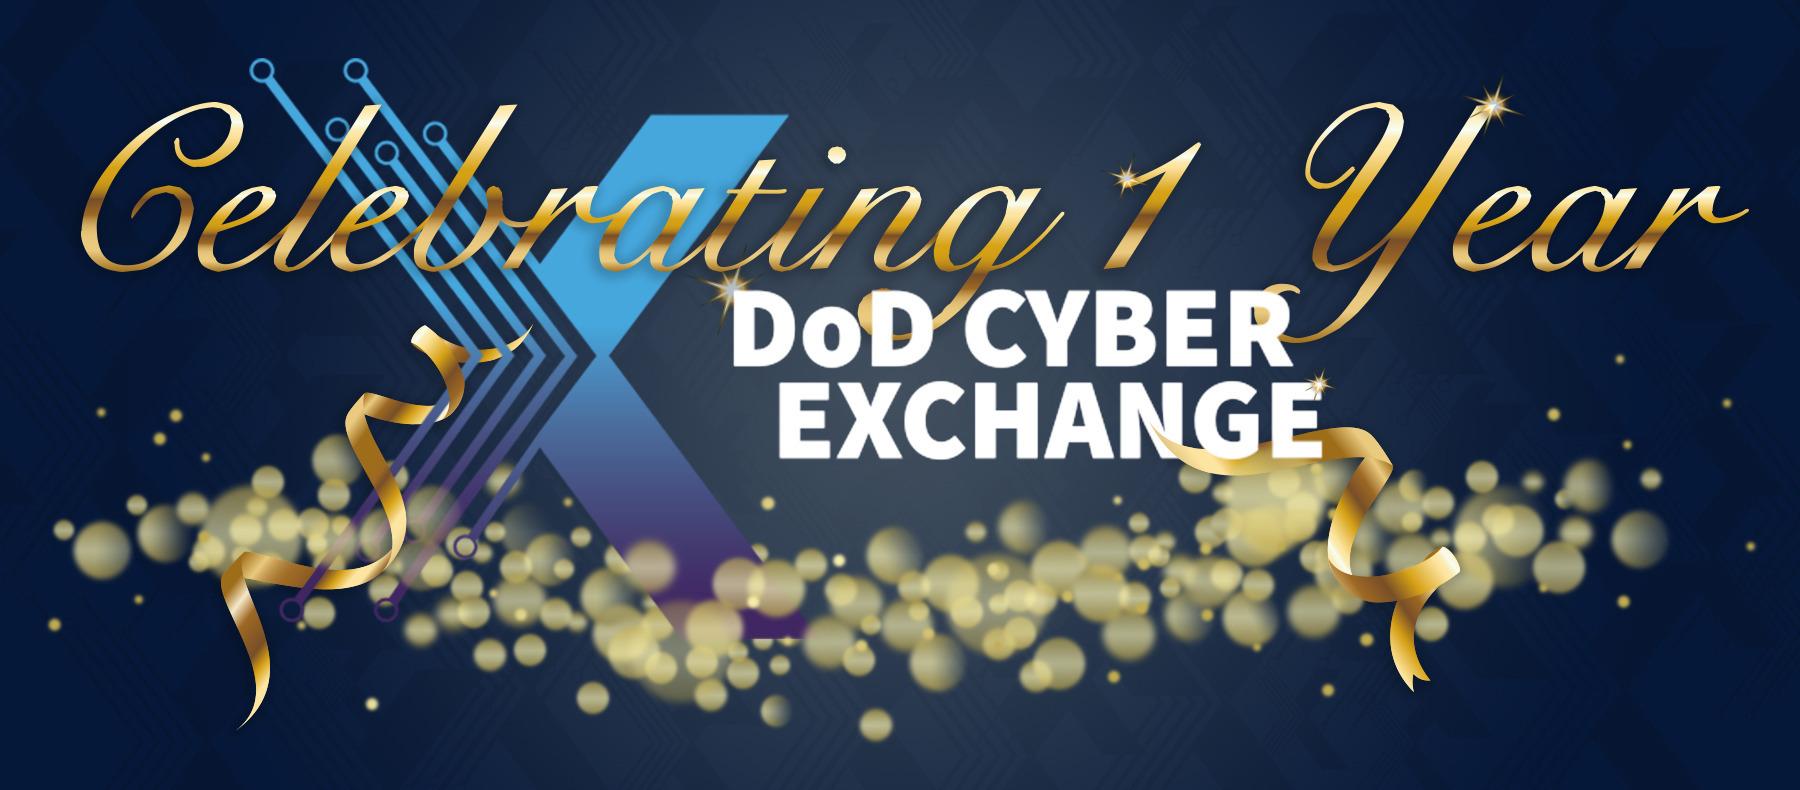 DoD Cyber Exchange - 1 Year Anniversary